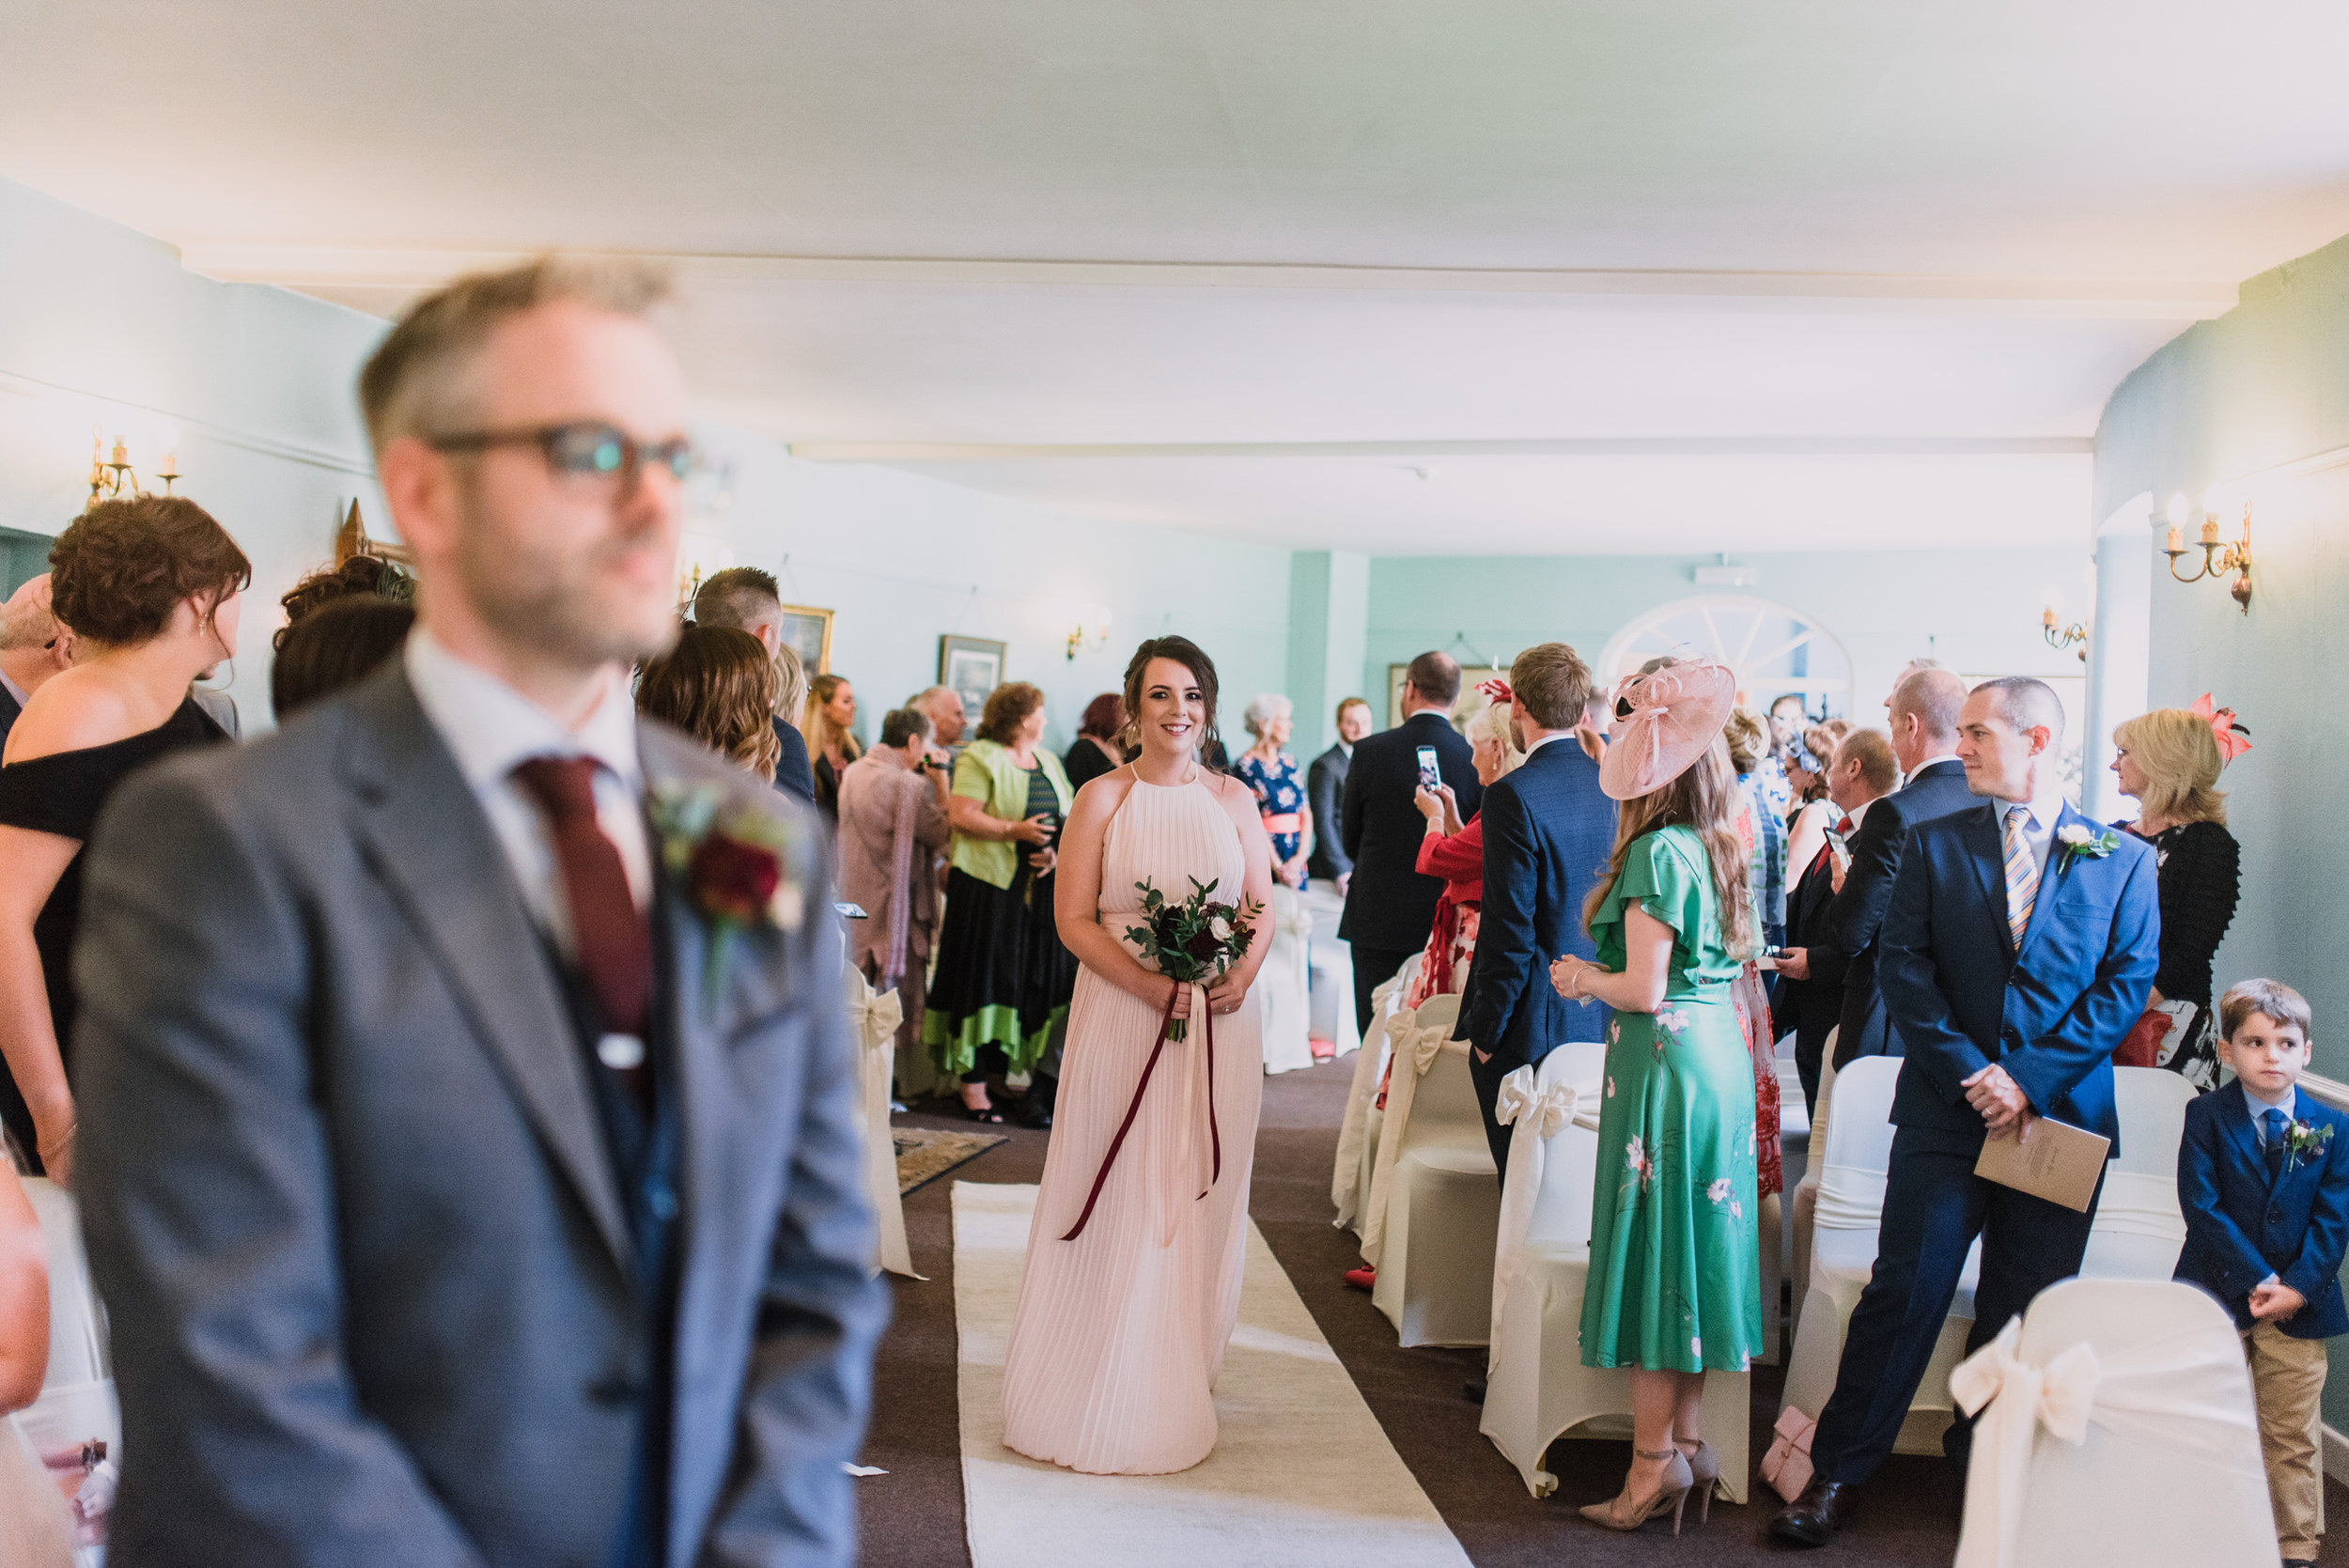 lissanoure castle wedding, northern ireland wedding photographer, romantic northern irish wedding venue, castle wedding ireland, natural wedding photography ni (46).jpg